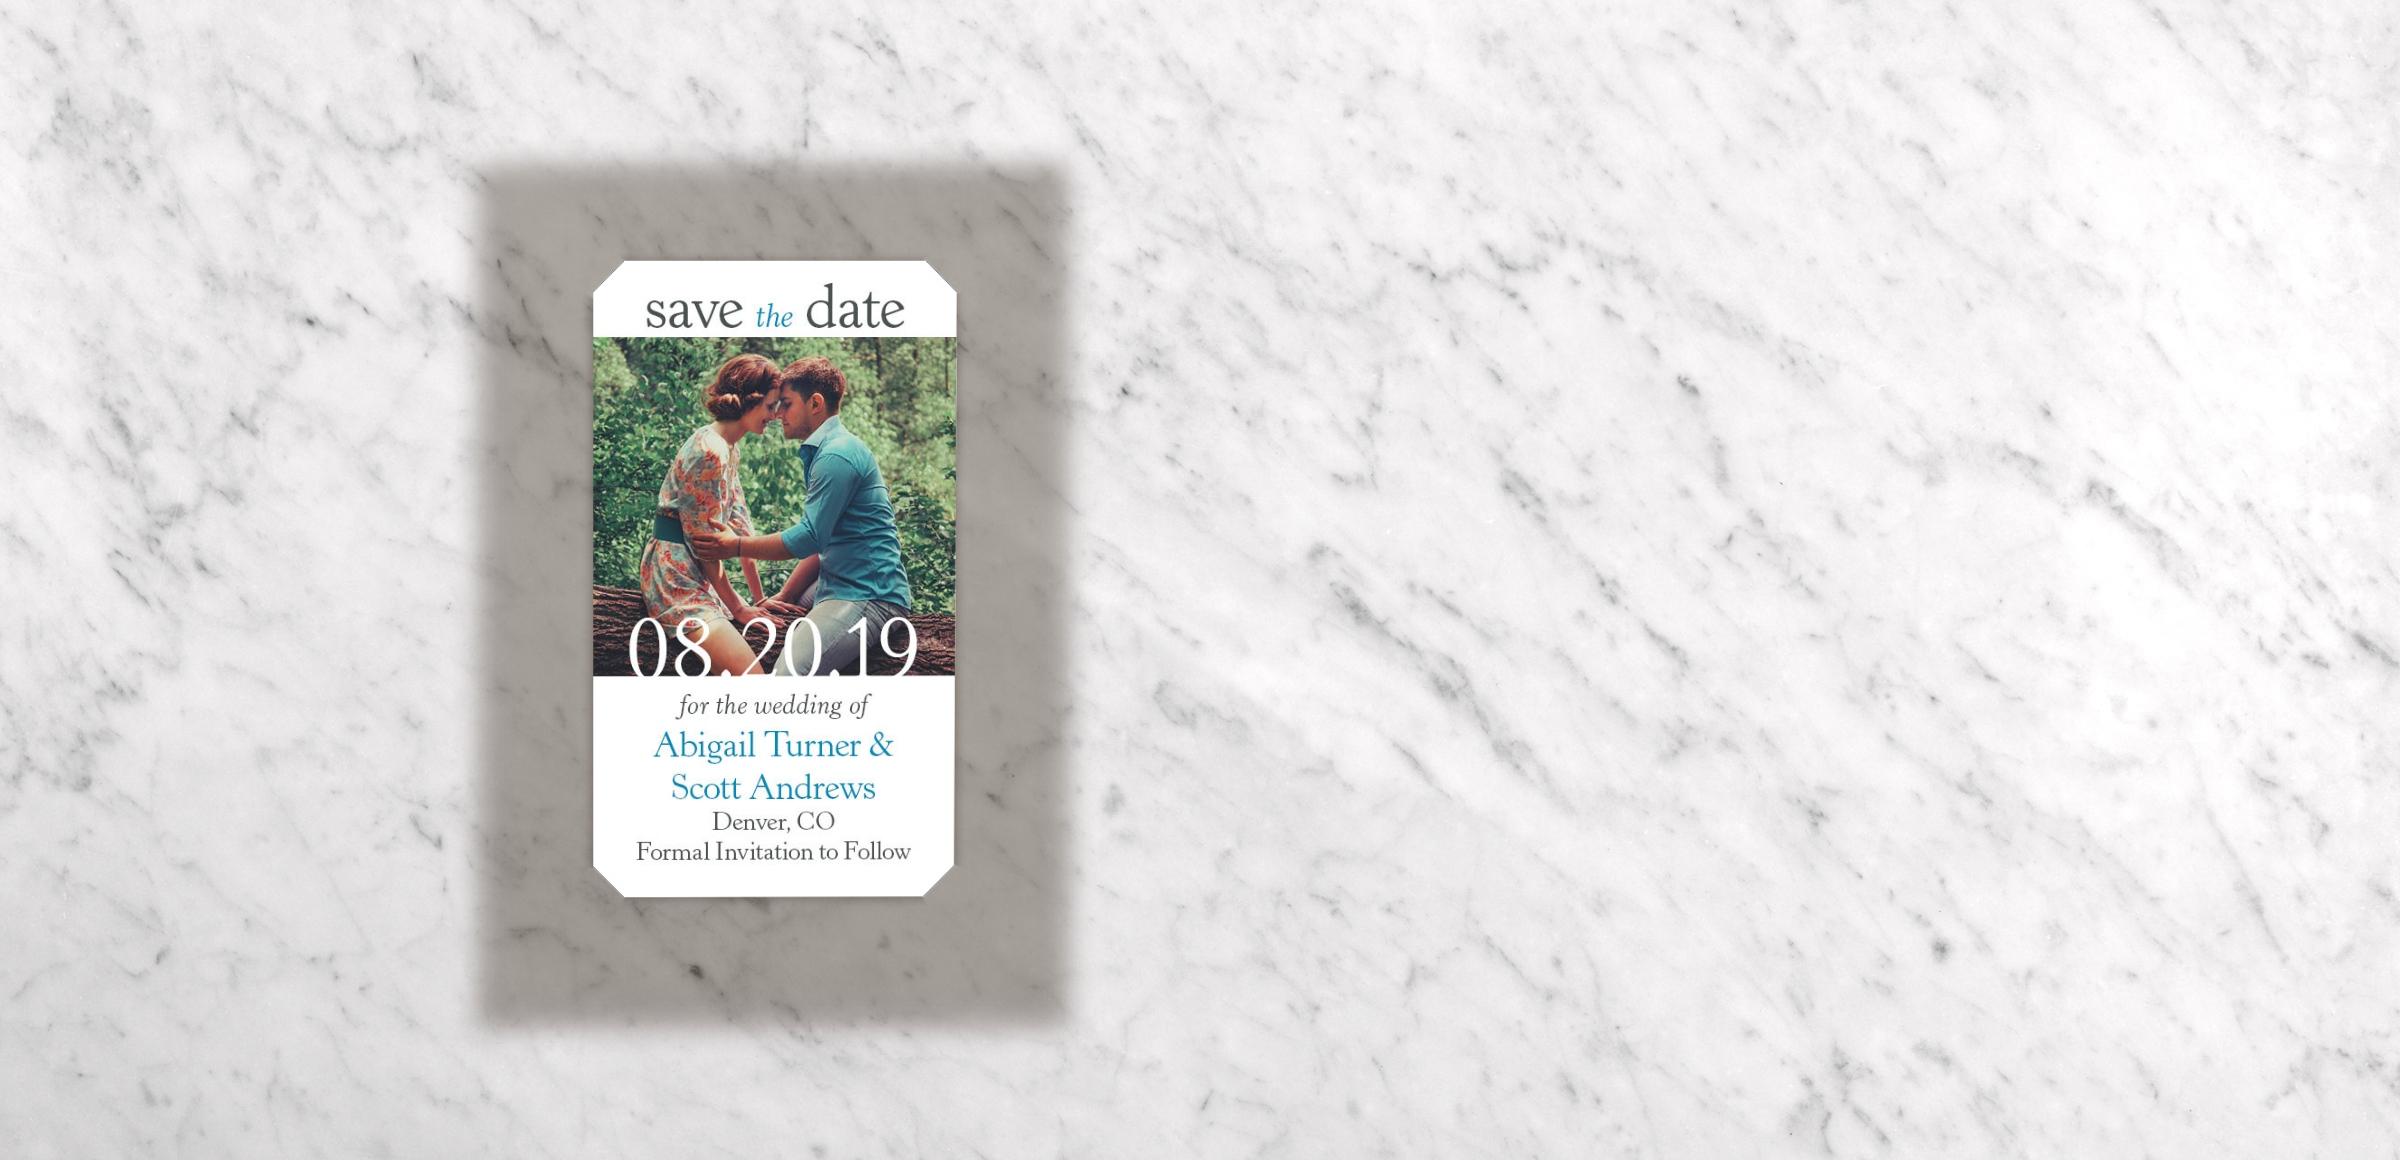 Mini Save Date Magnets - Devoted Magnetstreet